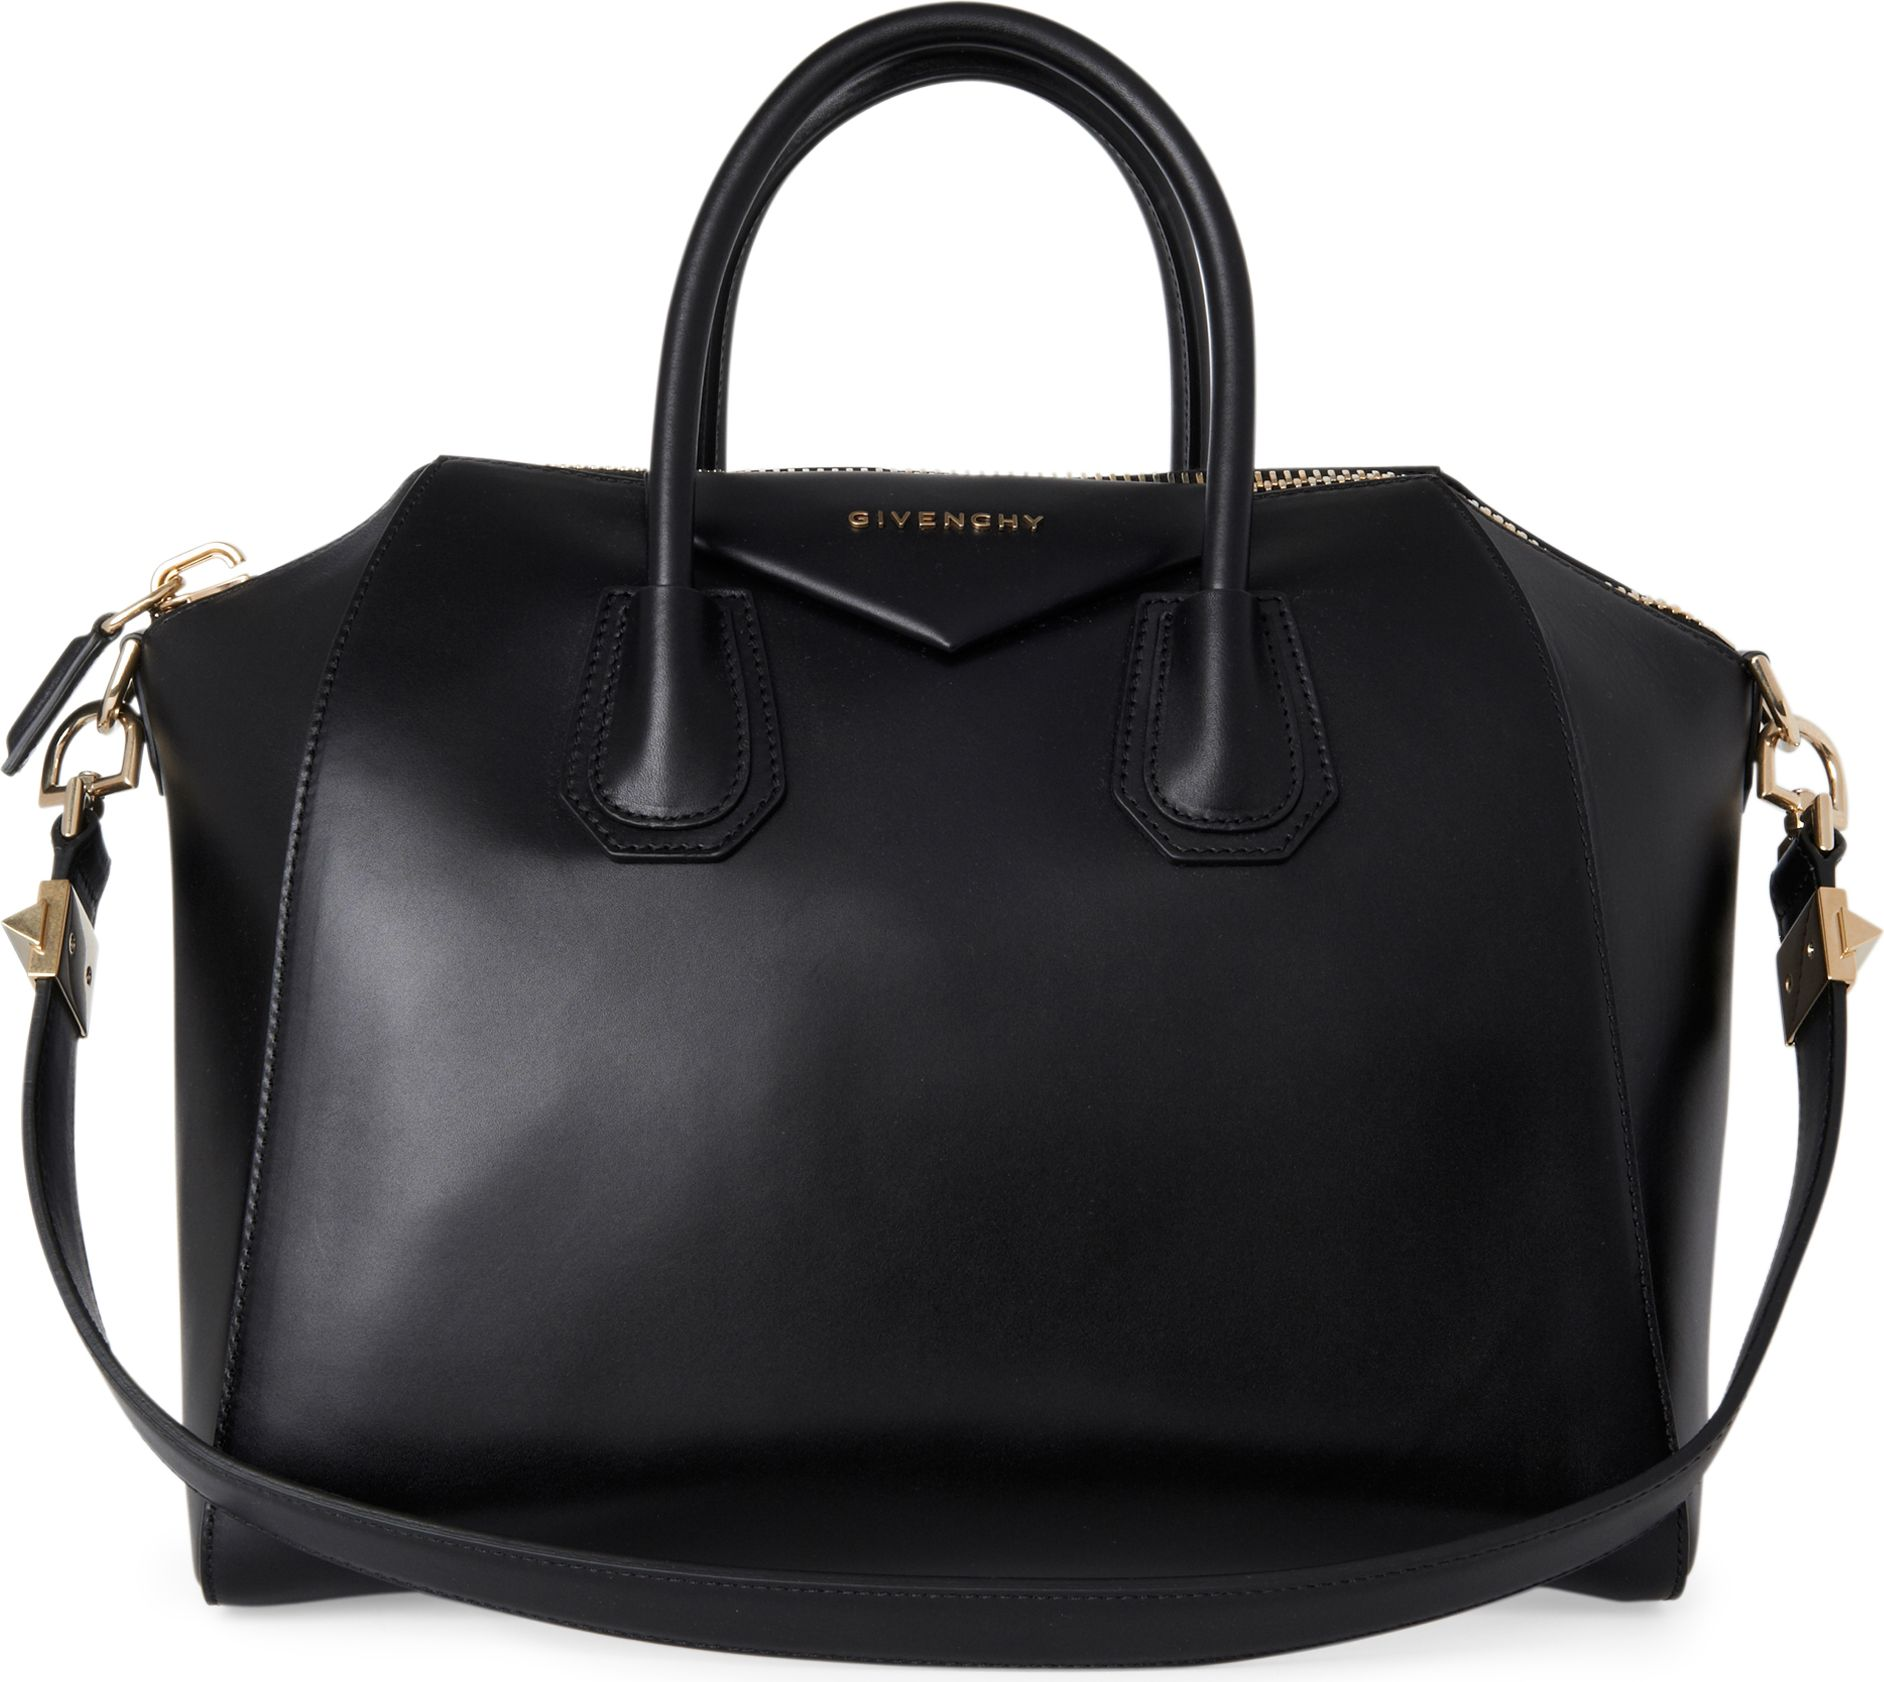 lyst givenchy antigona medium smooth leather tote in black. Black Bedroom Furniture Sets. Home Design Ideas